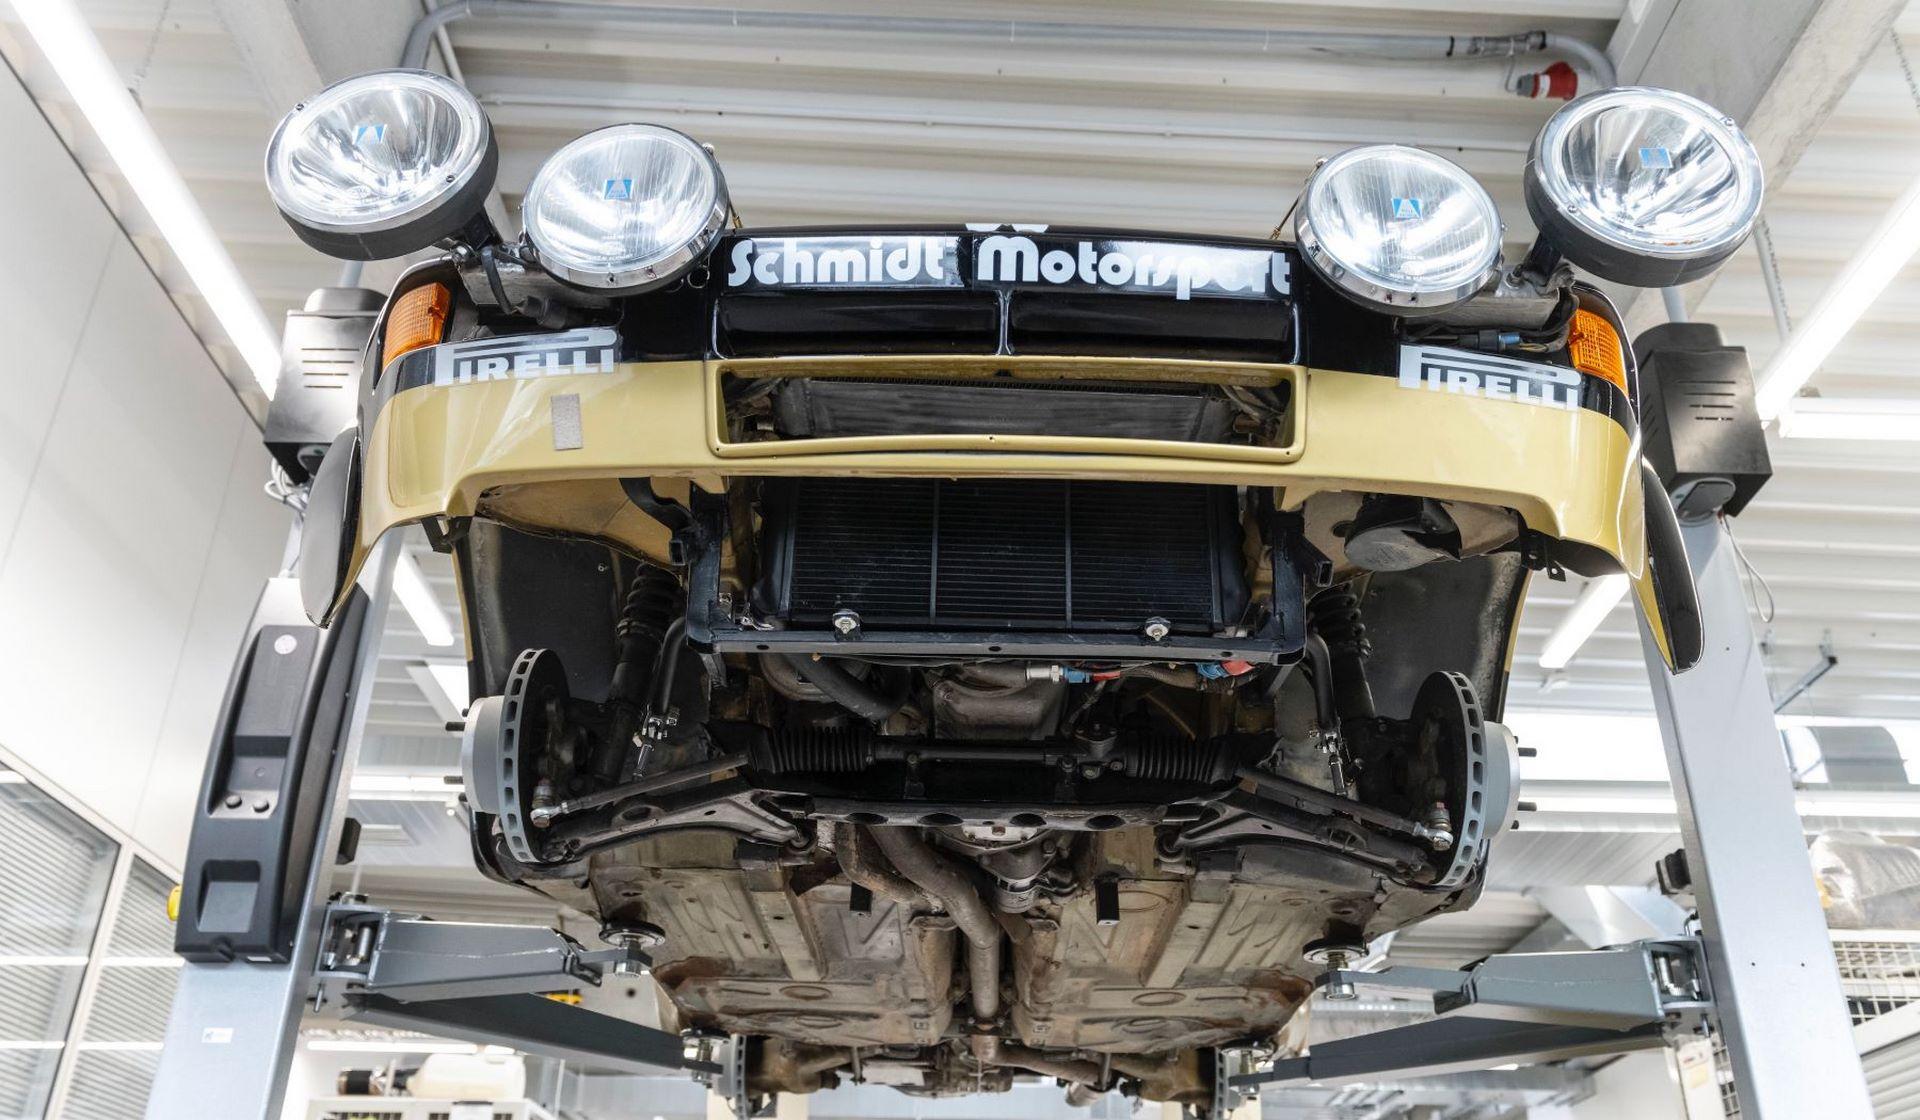 Porsche-924-Carrera-GTS-rally-car-Walter-Rohrl-23